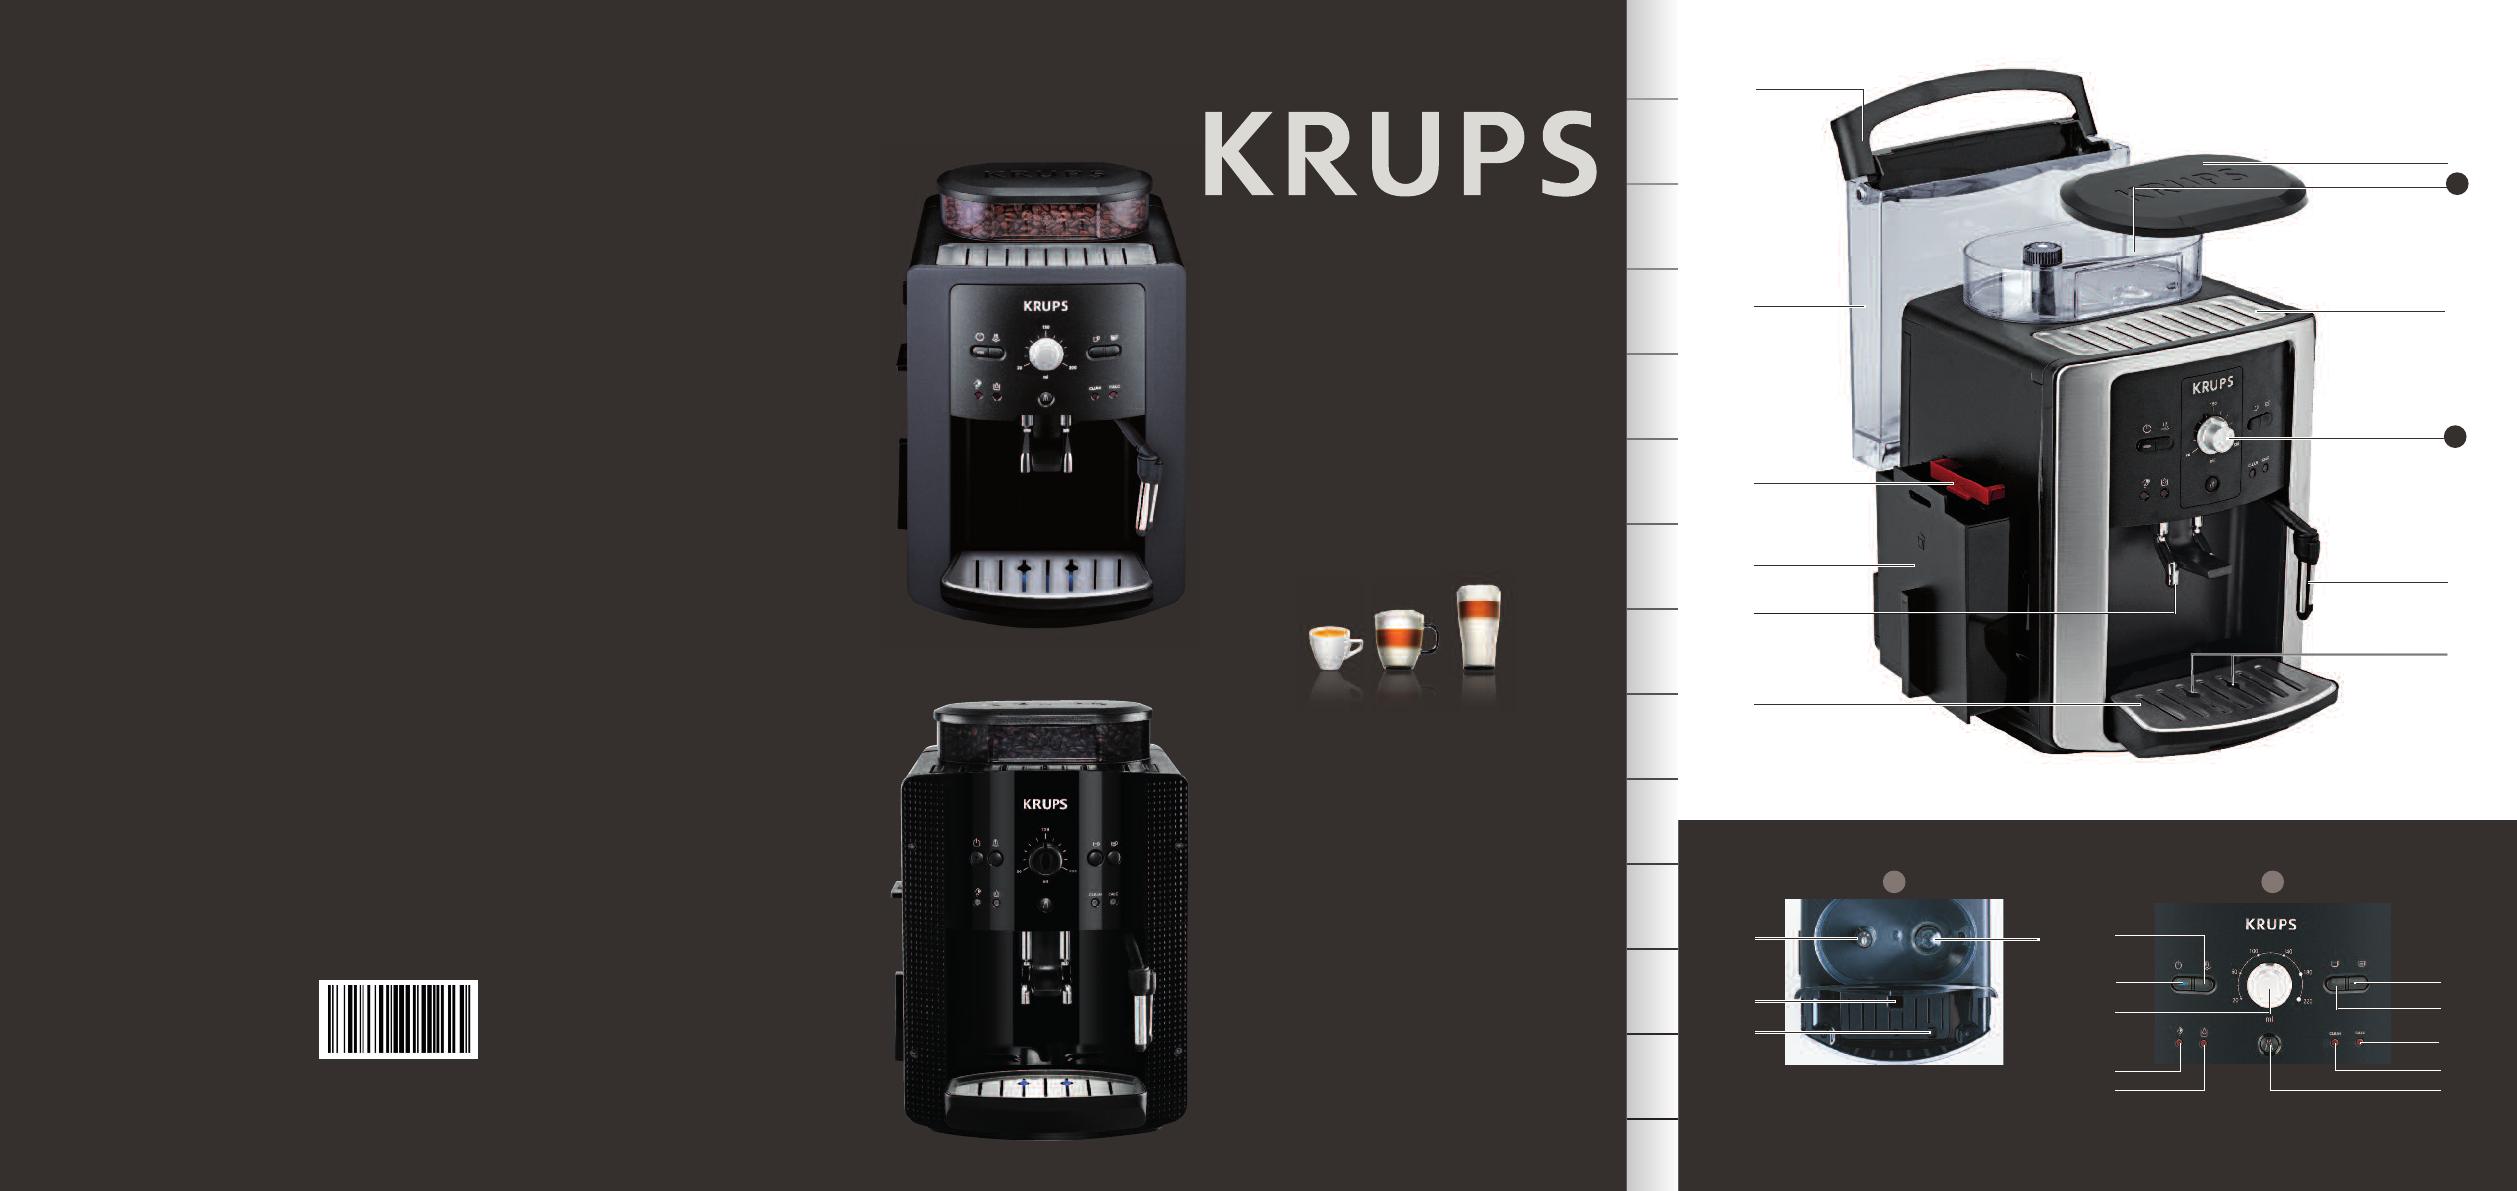 Handleiding Krups EA 8080 (pagina 1 van 16) (English)